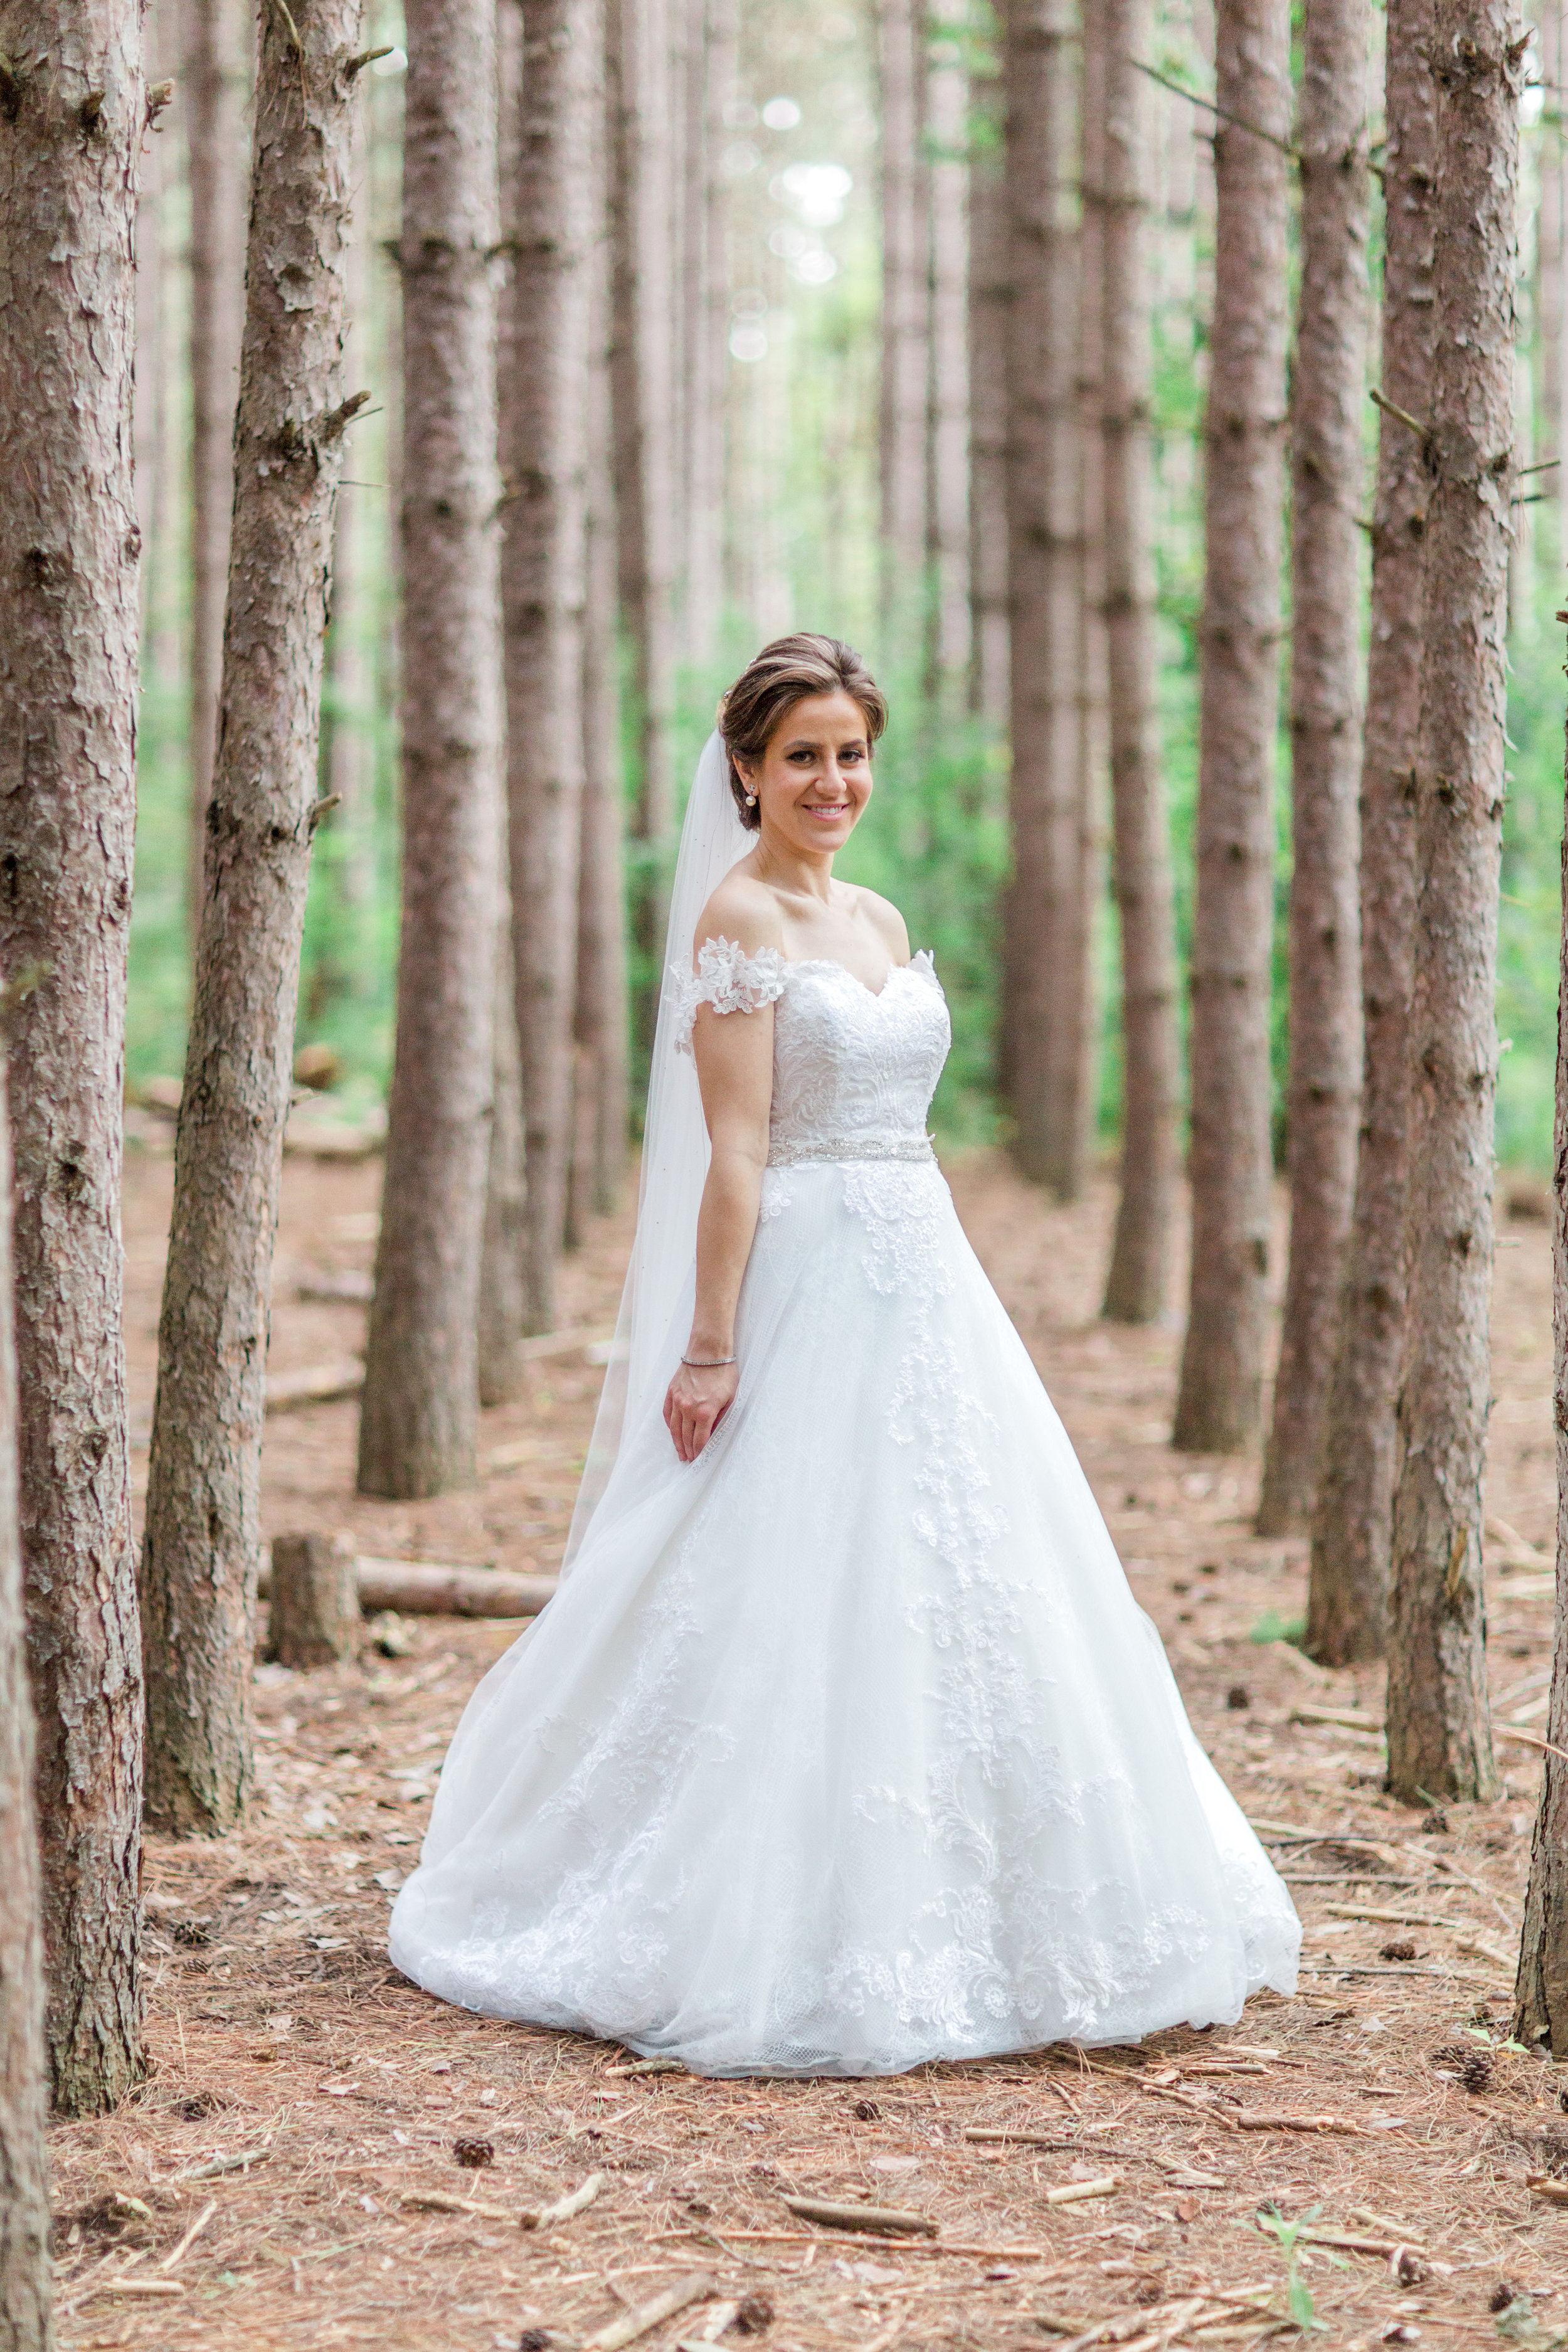 Danielle-Giroux-Amir-Golbazi-Toronto-Wedding-Photographer-Bellvue-Manor_DeLuca_1-745.jpg